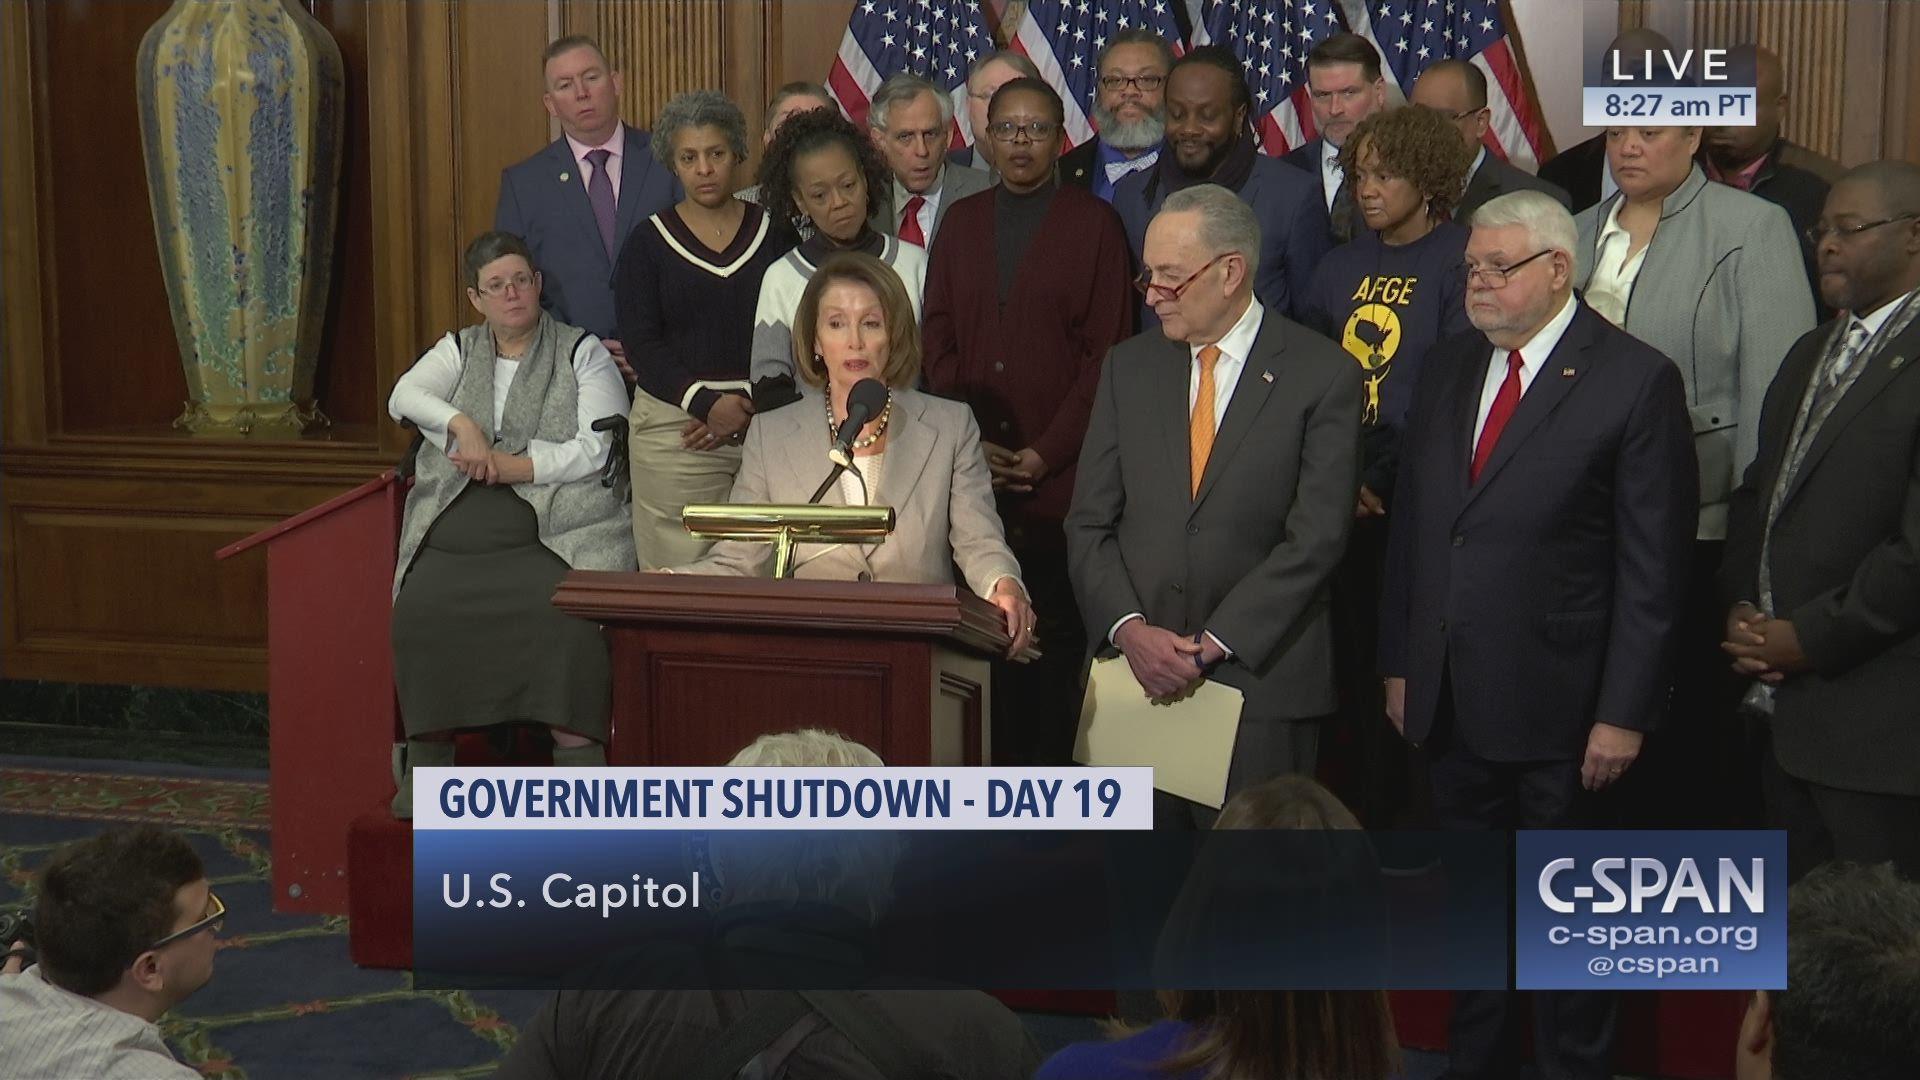 Speaker Pelosi and Minority Leader Schumer on Government Shutdown